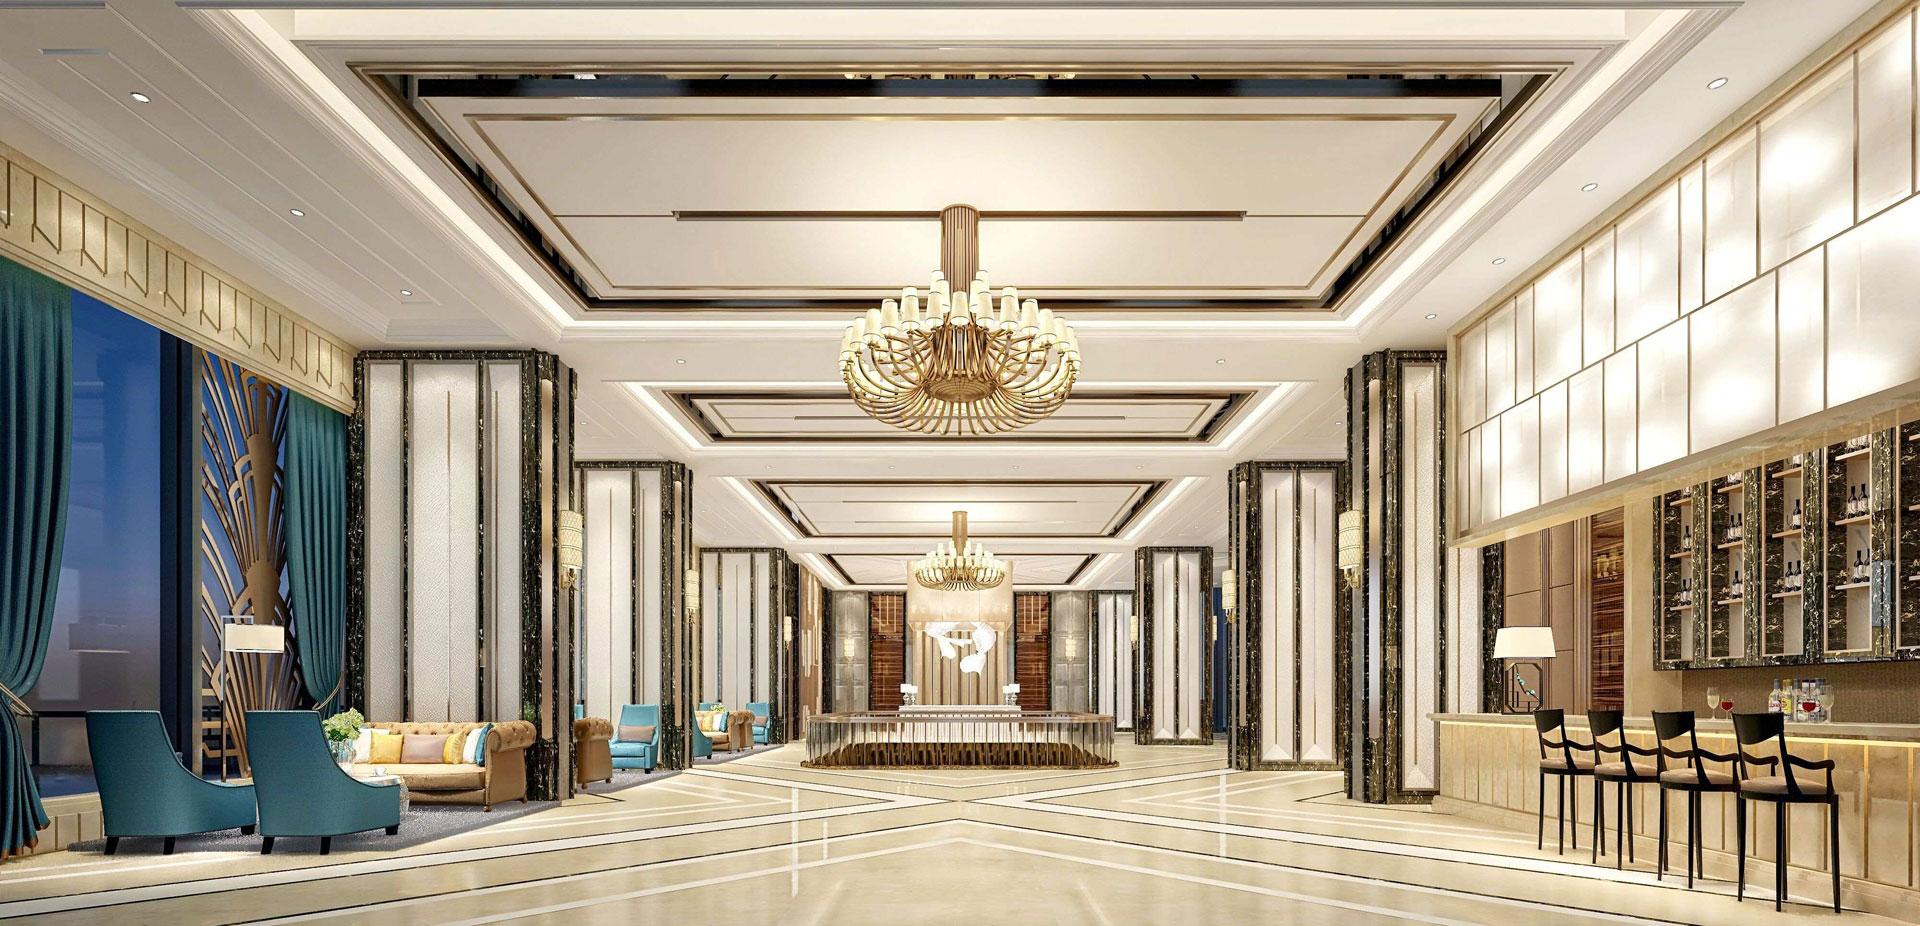 Dự án shophouse Grand World Phú Quốc - Vinpearl Phú Quốc